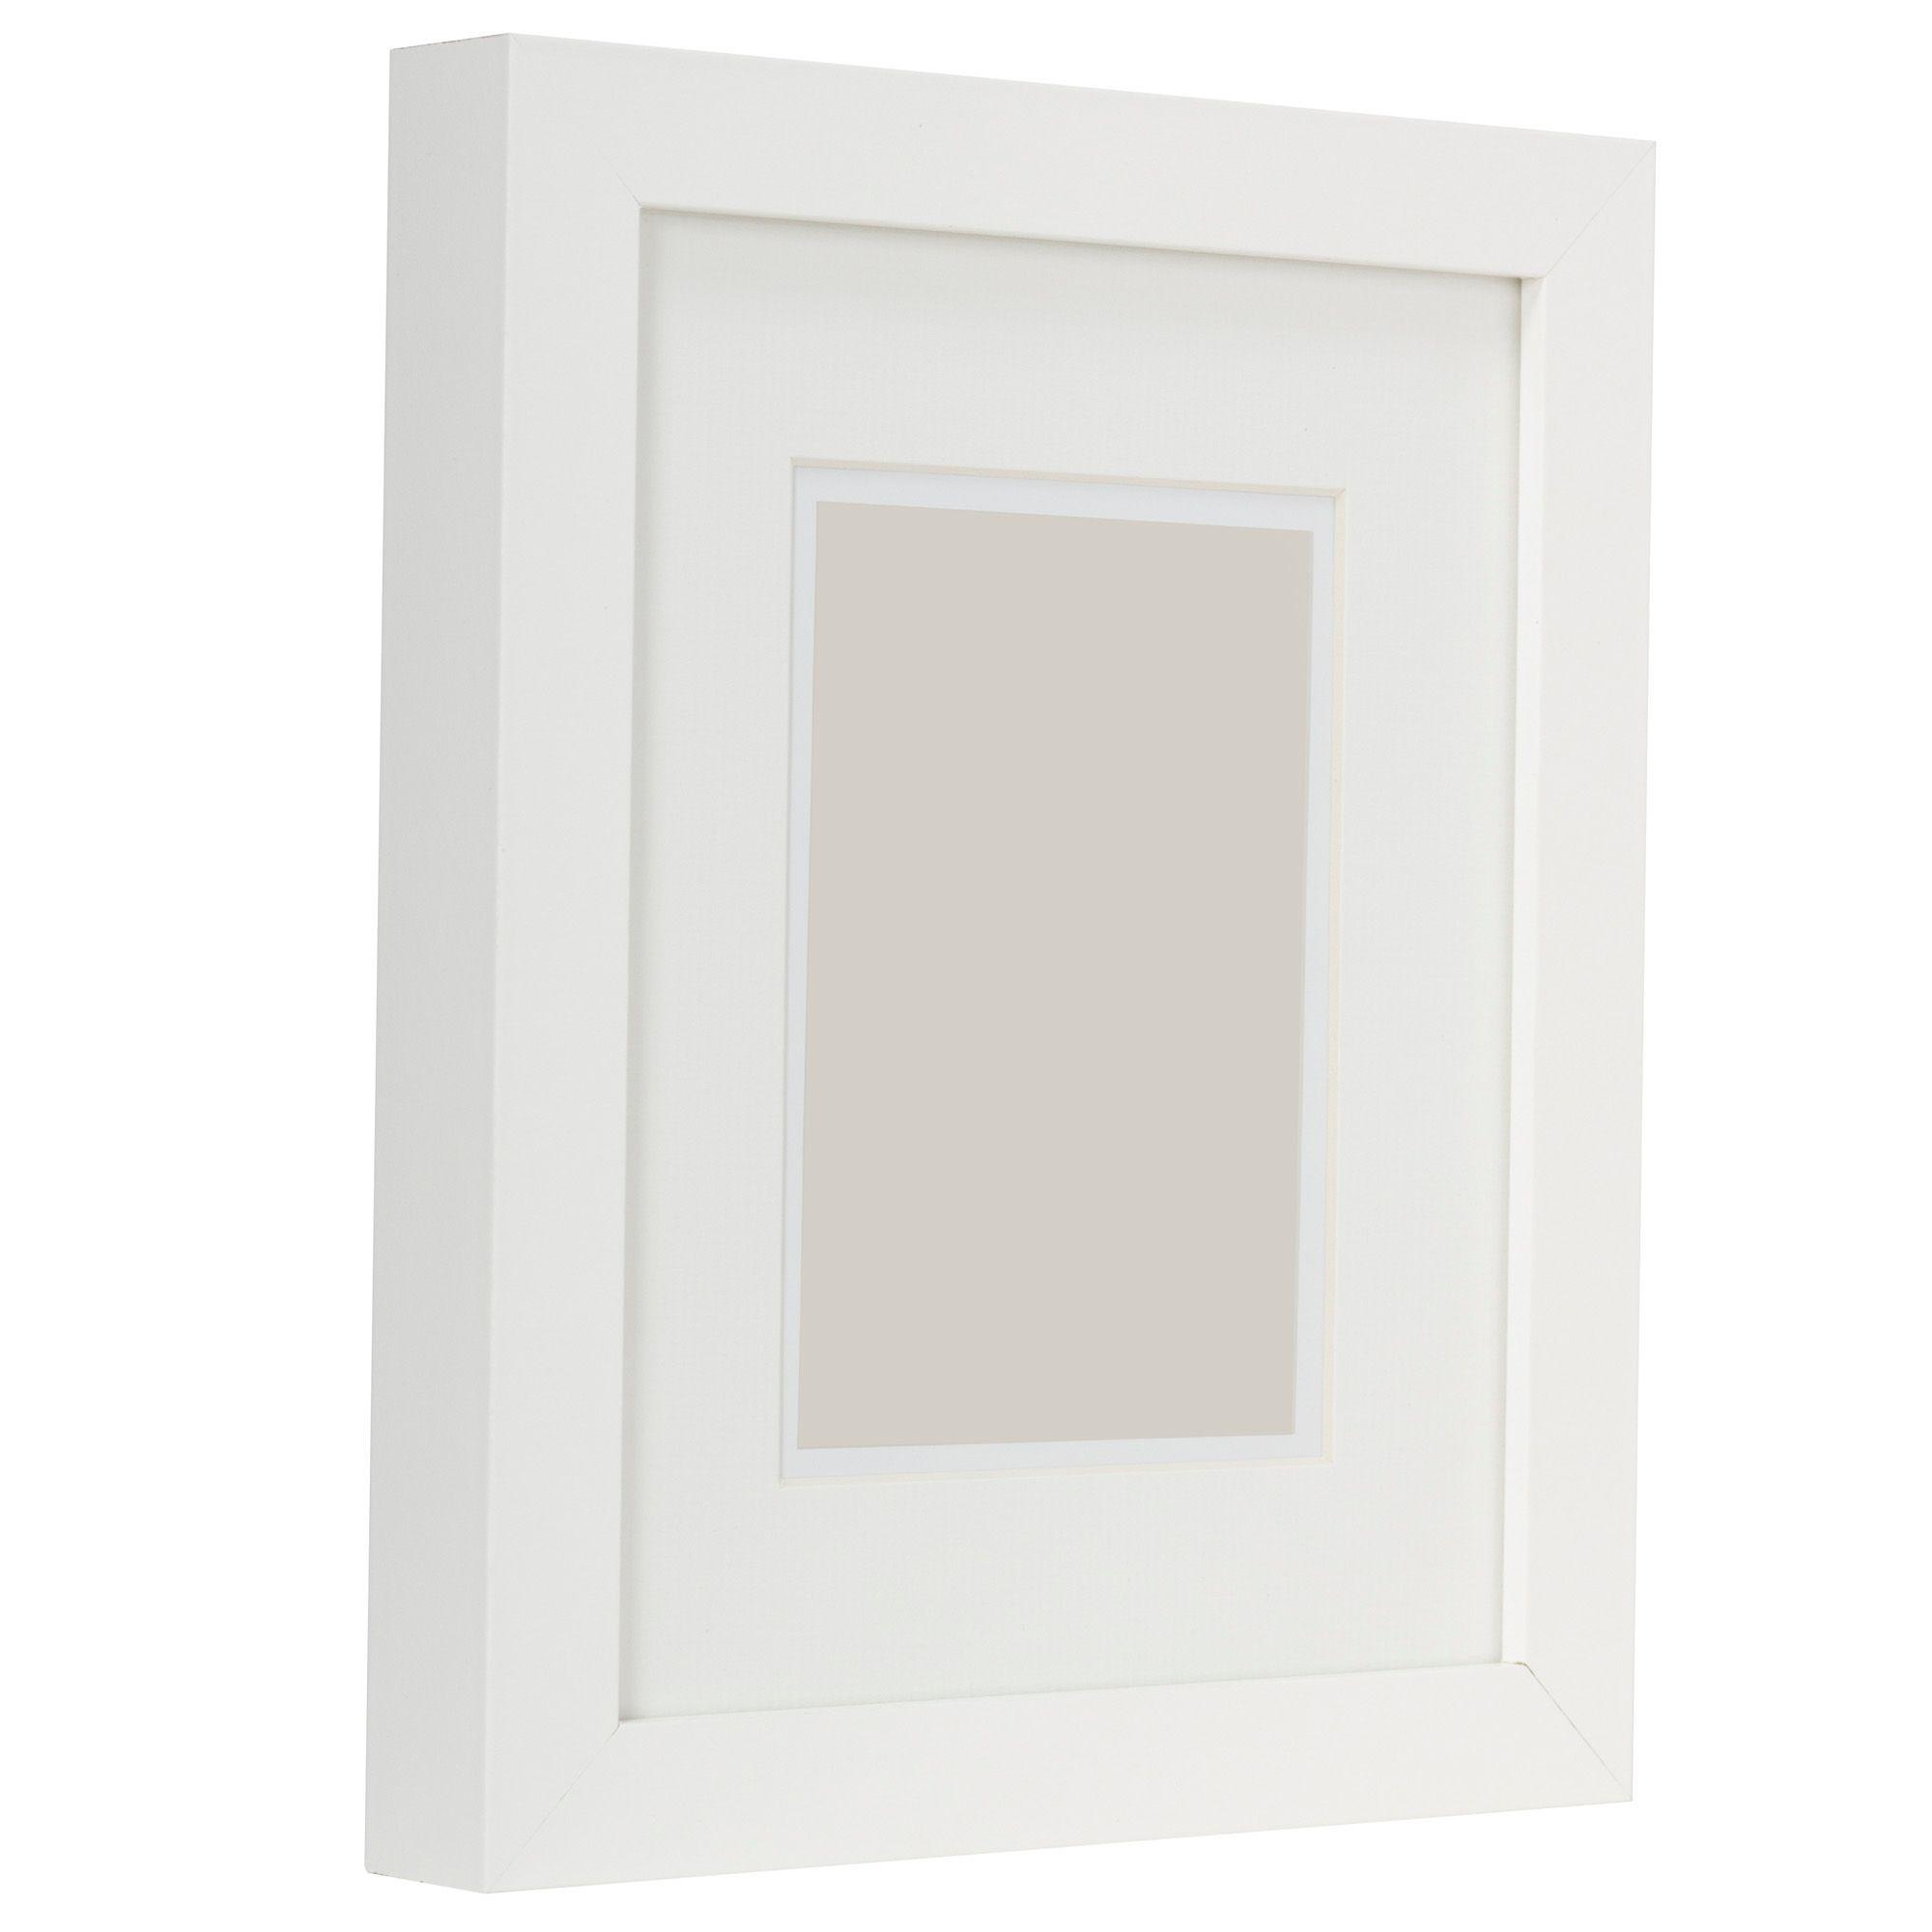 Nett White Wood Picture Frame Bilder - Bilderrahmen Ideen - szurop.info